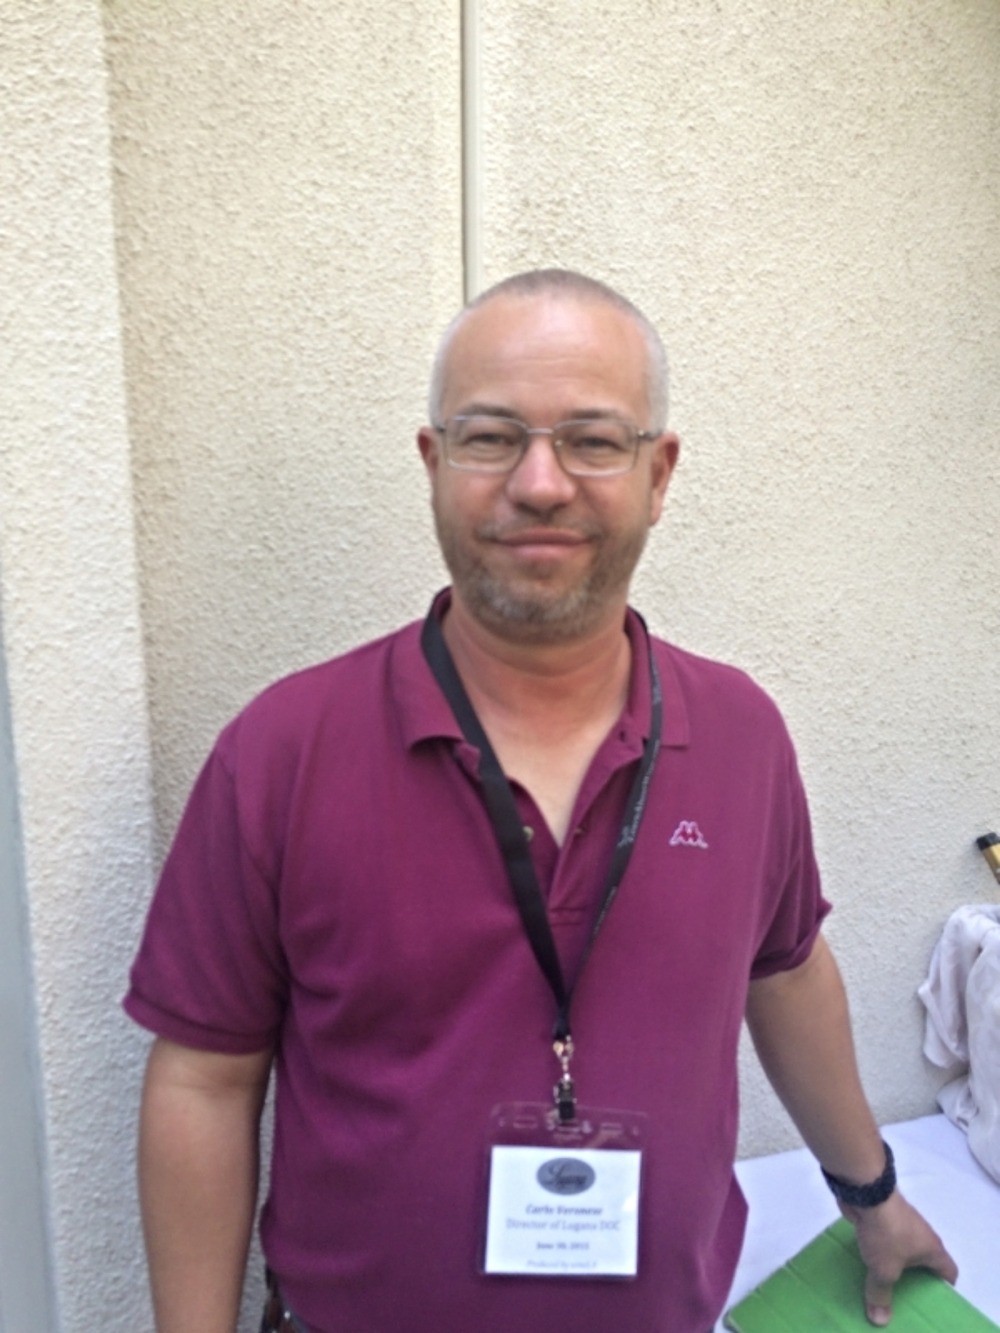 Carlo Veronese, Director of theLugana DOC